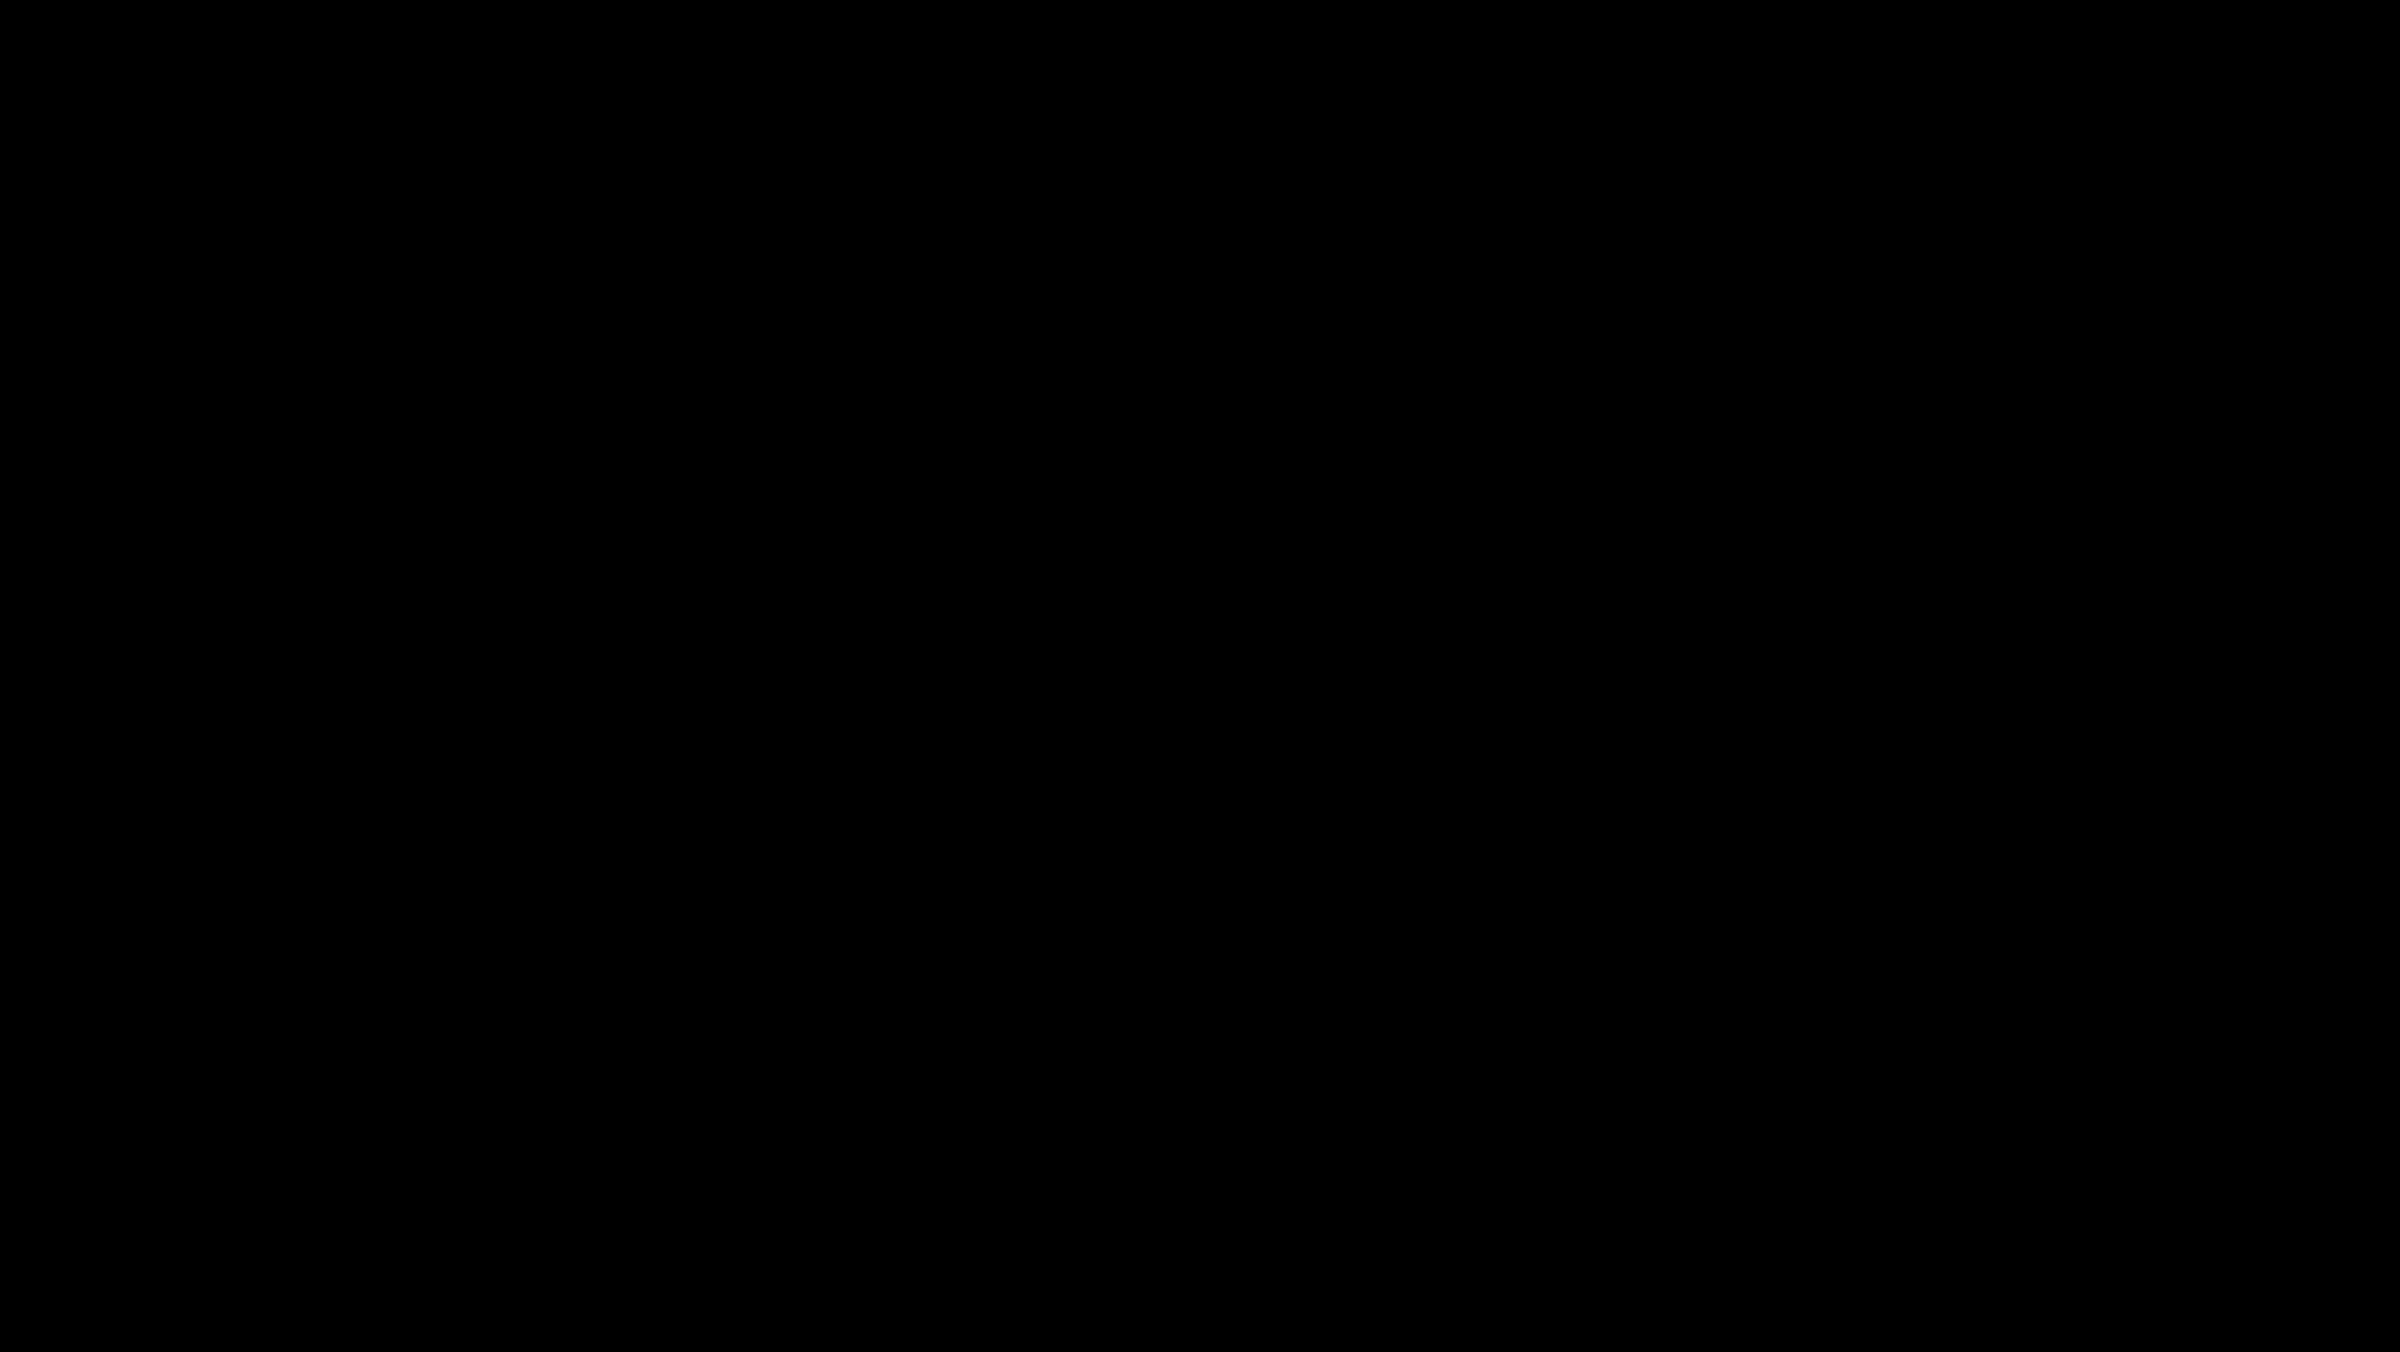 Logo Onlineshop Muli